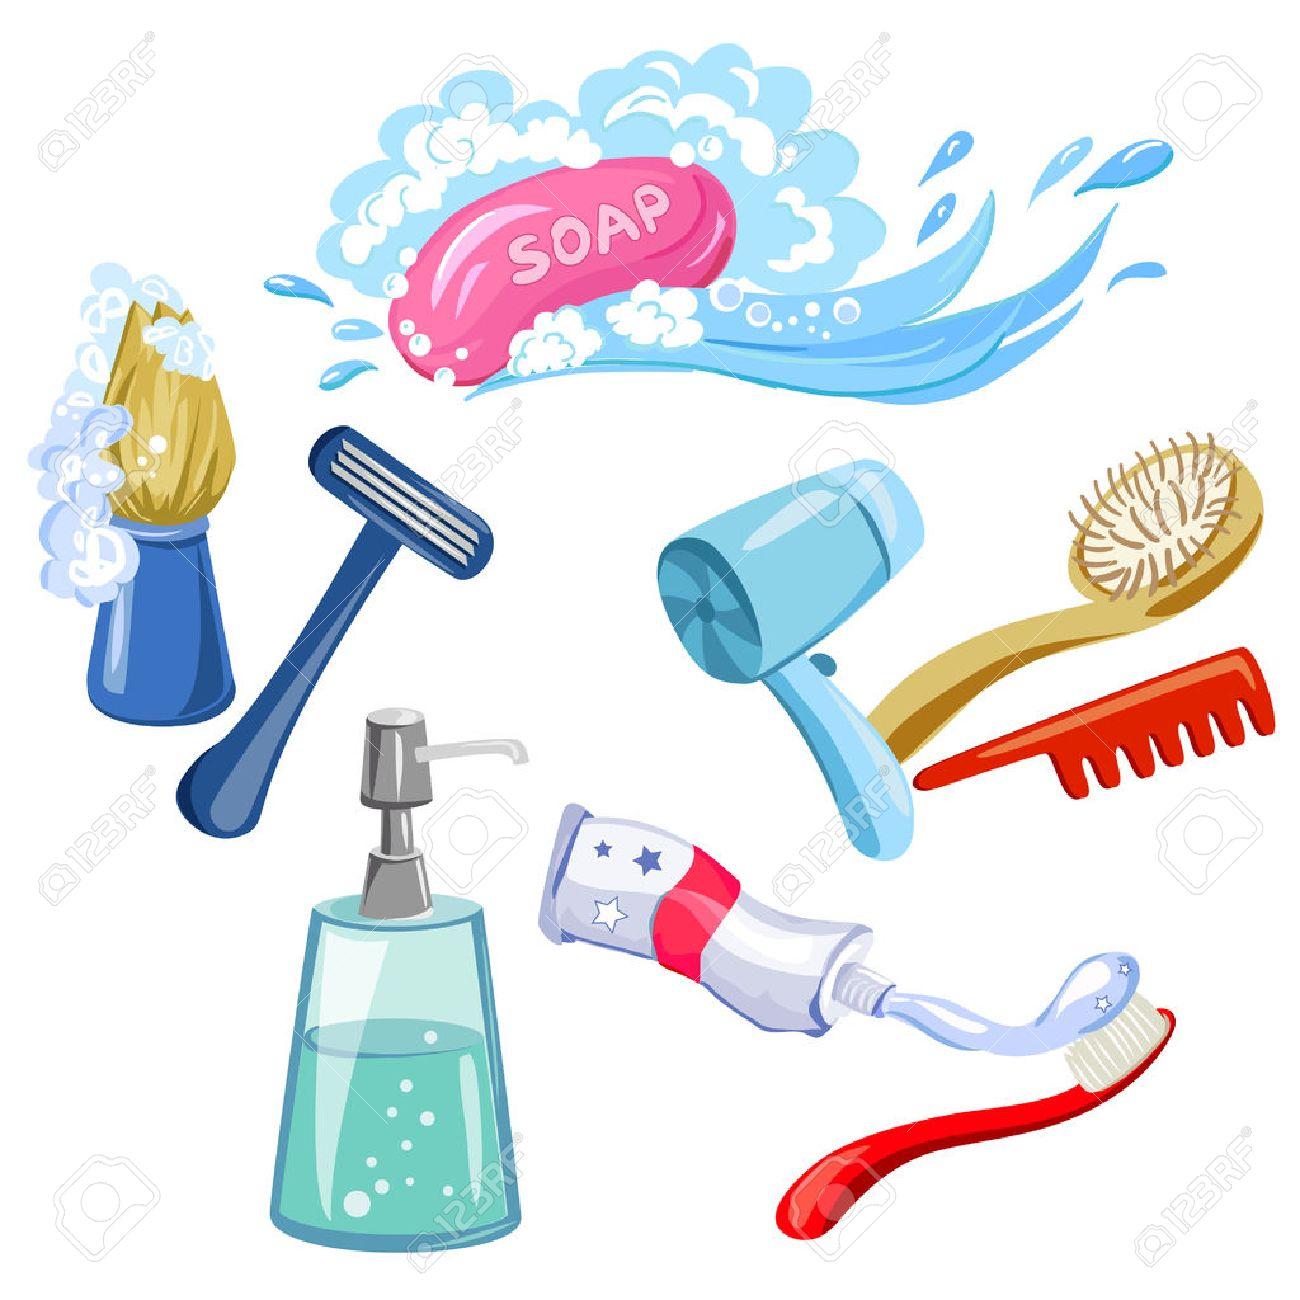 hygiene, personal care, items. vector illustration Standard-Bild - 31688496